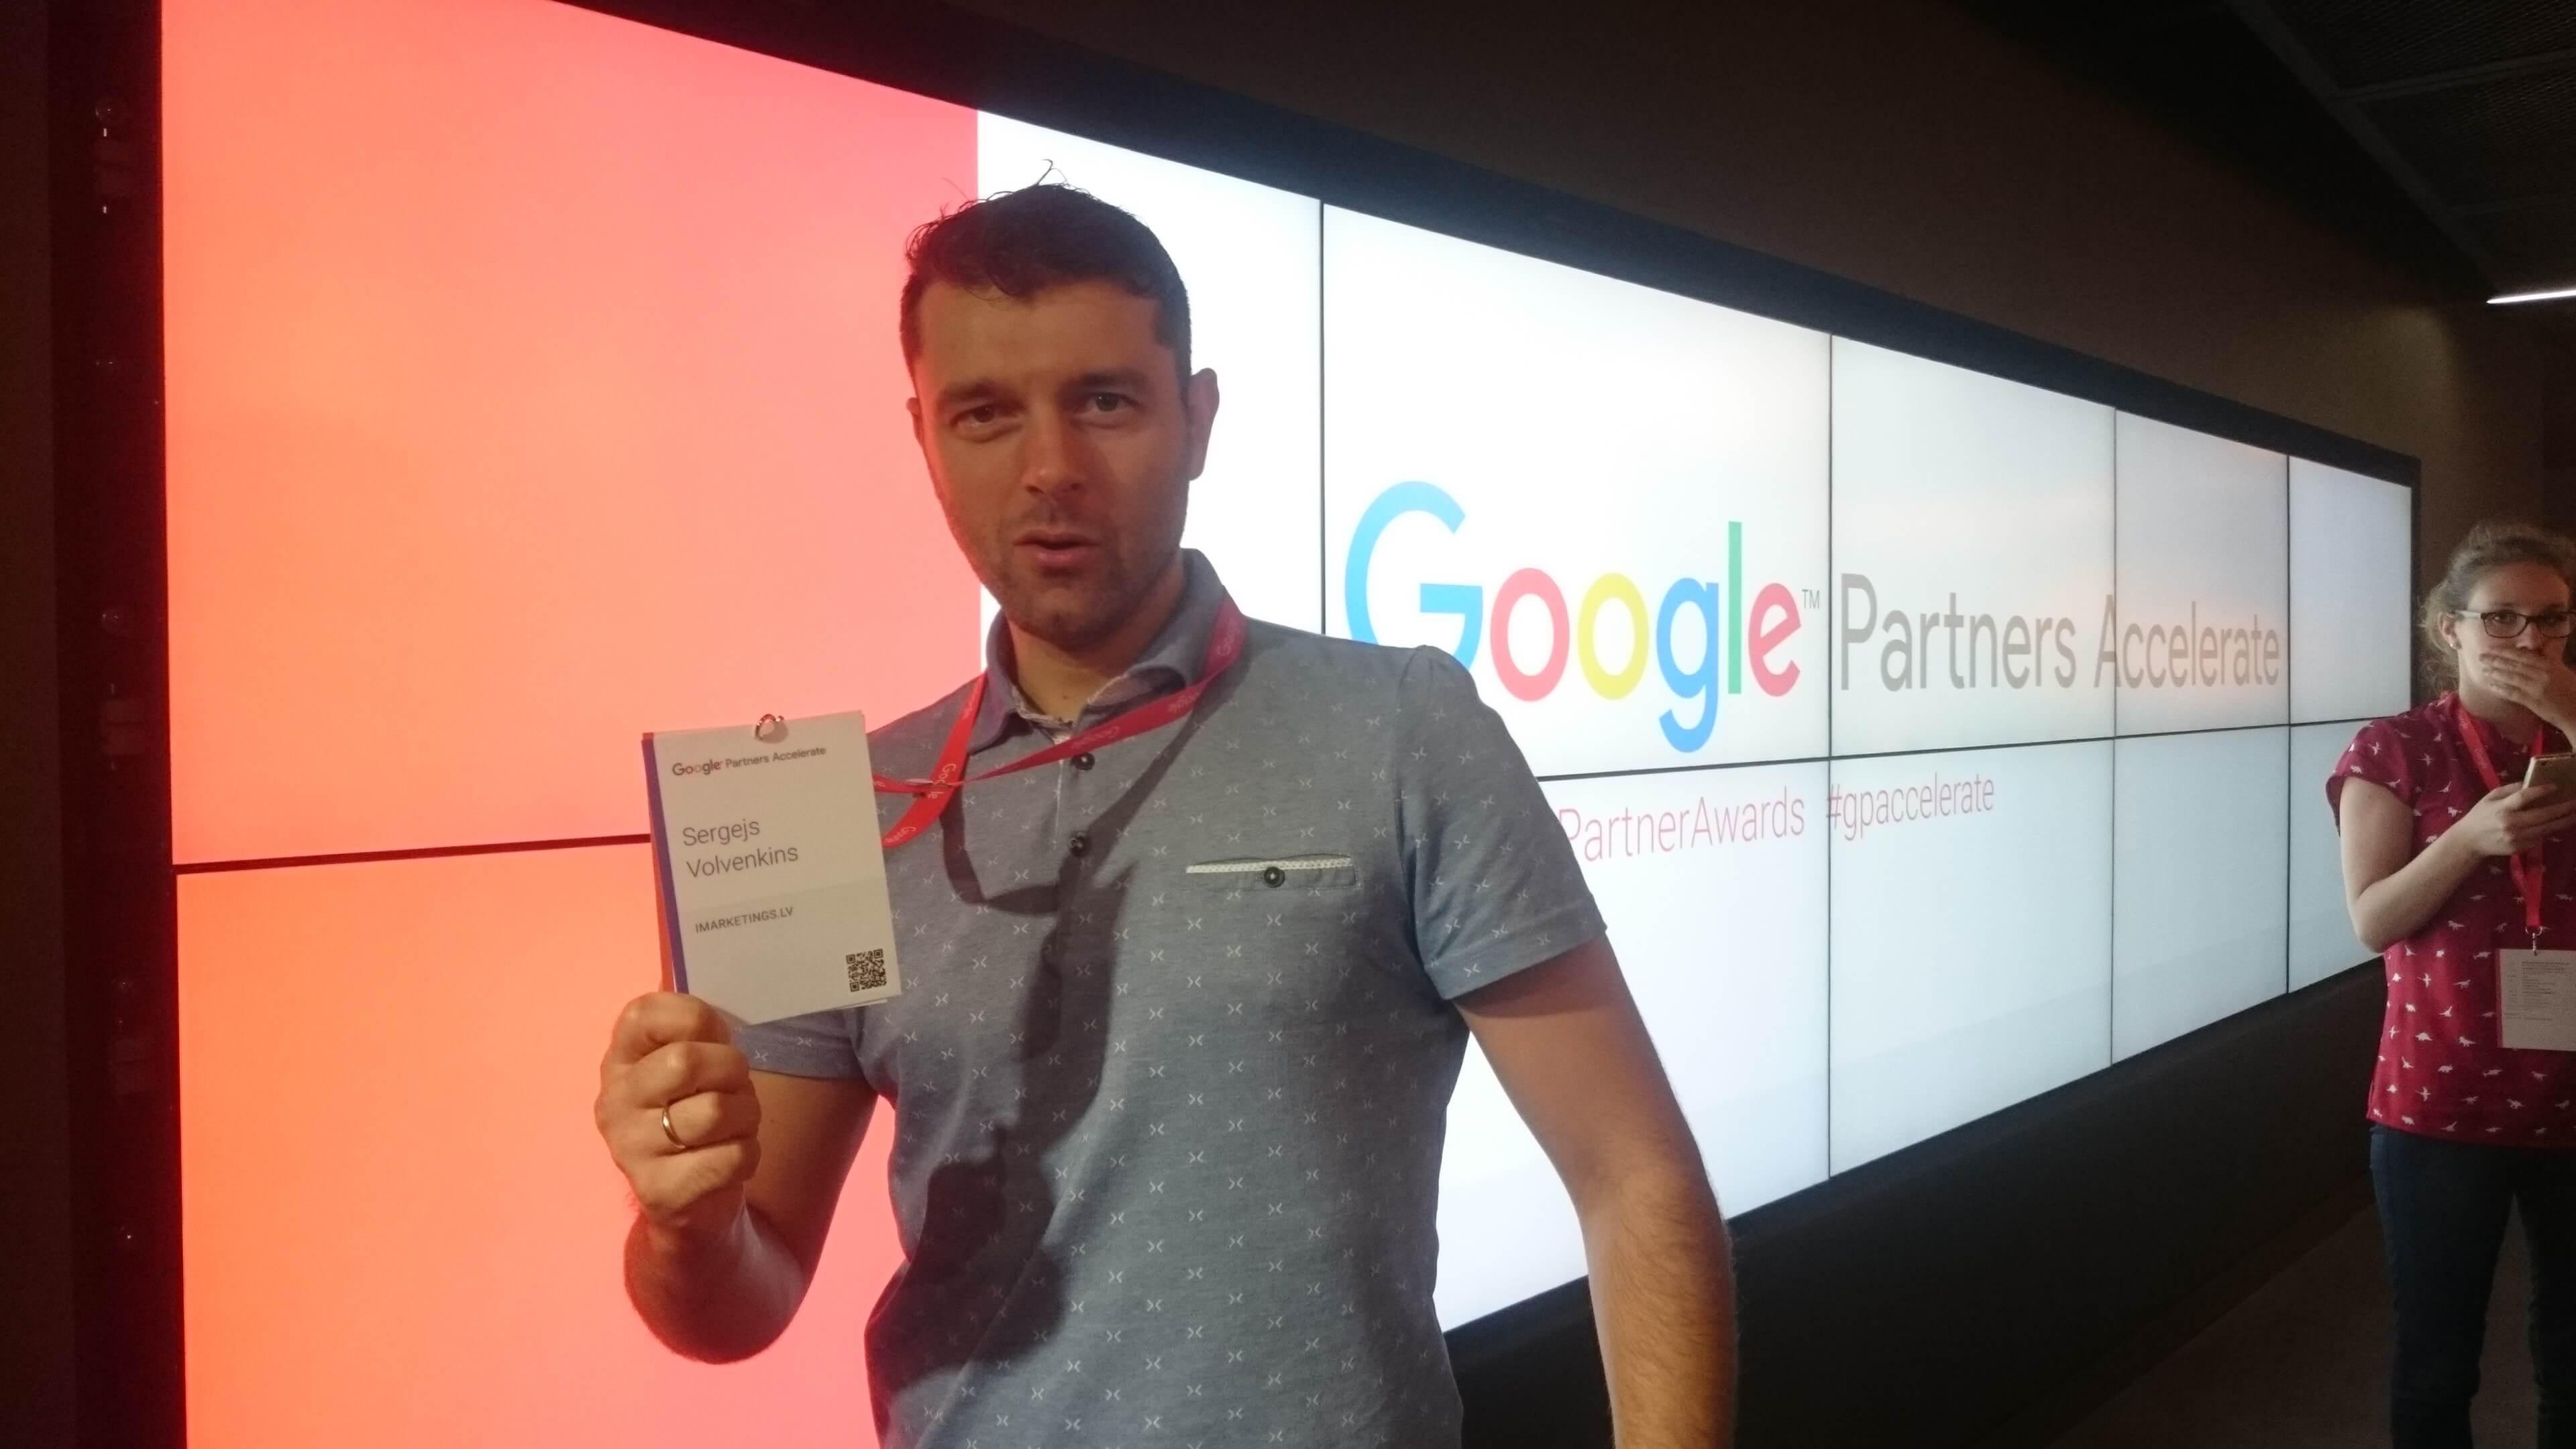 Google Partners Awards - Sergejs Volvenkins